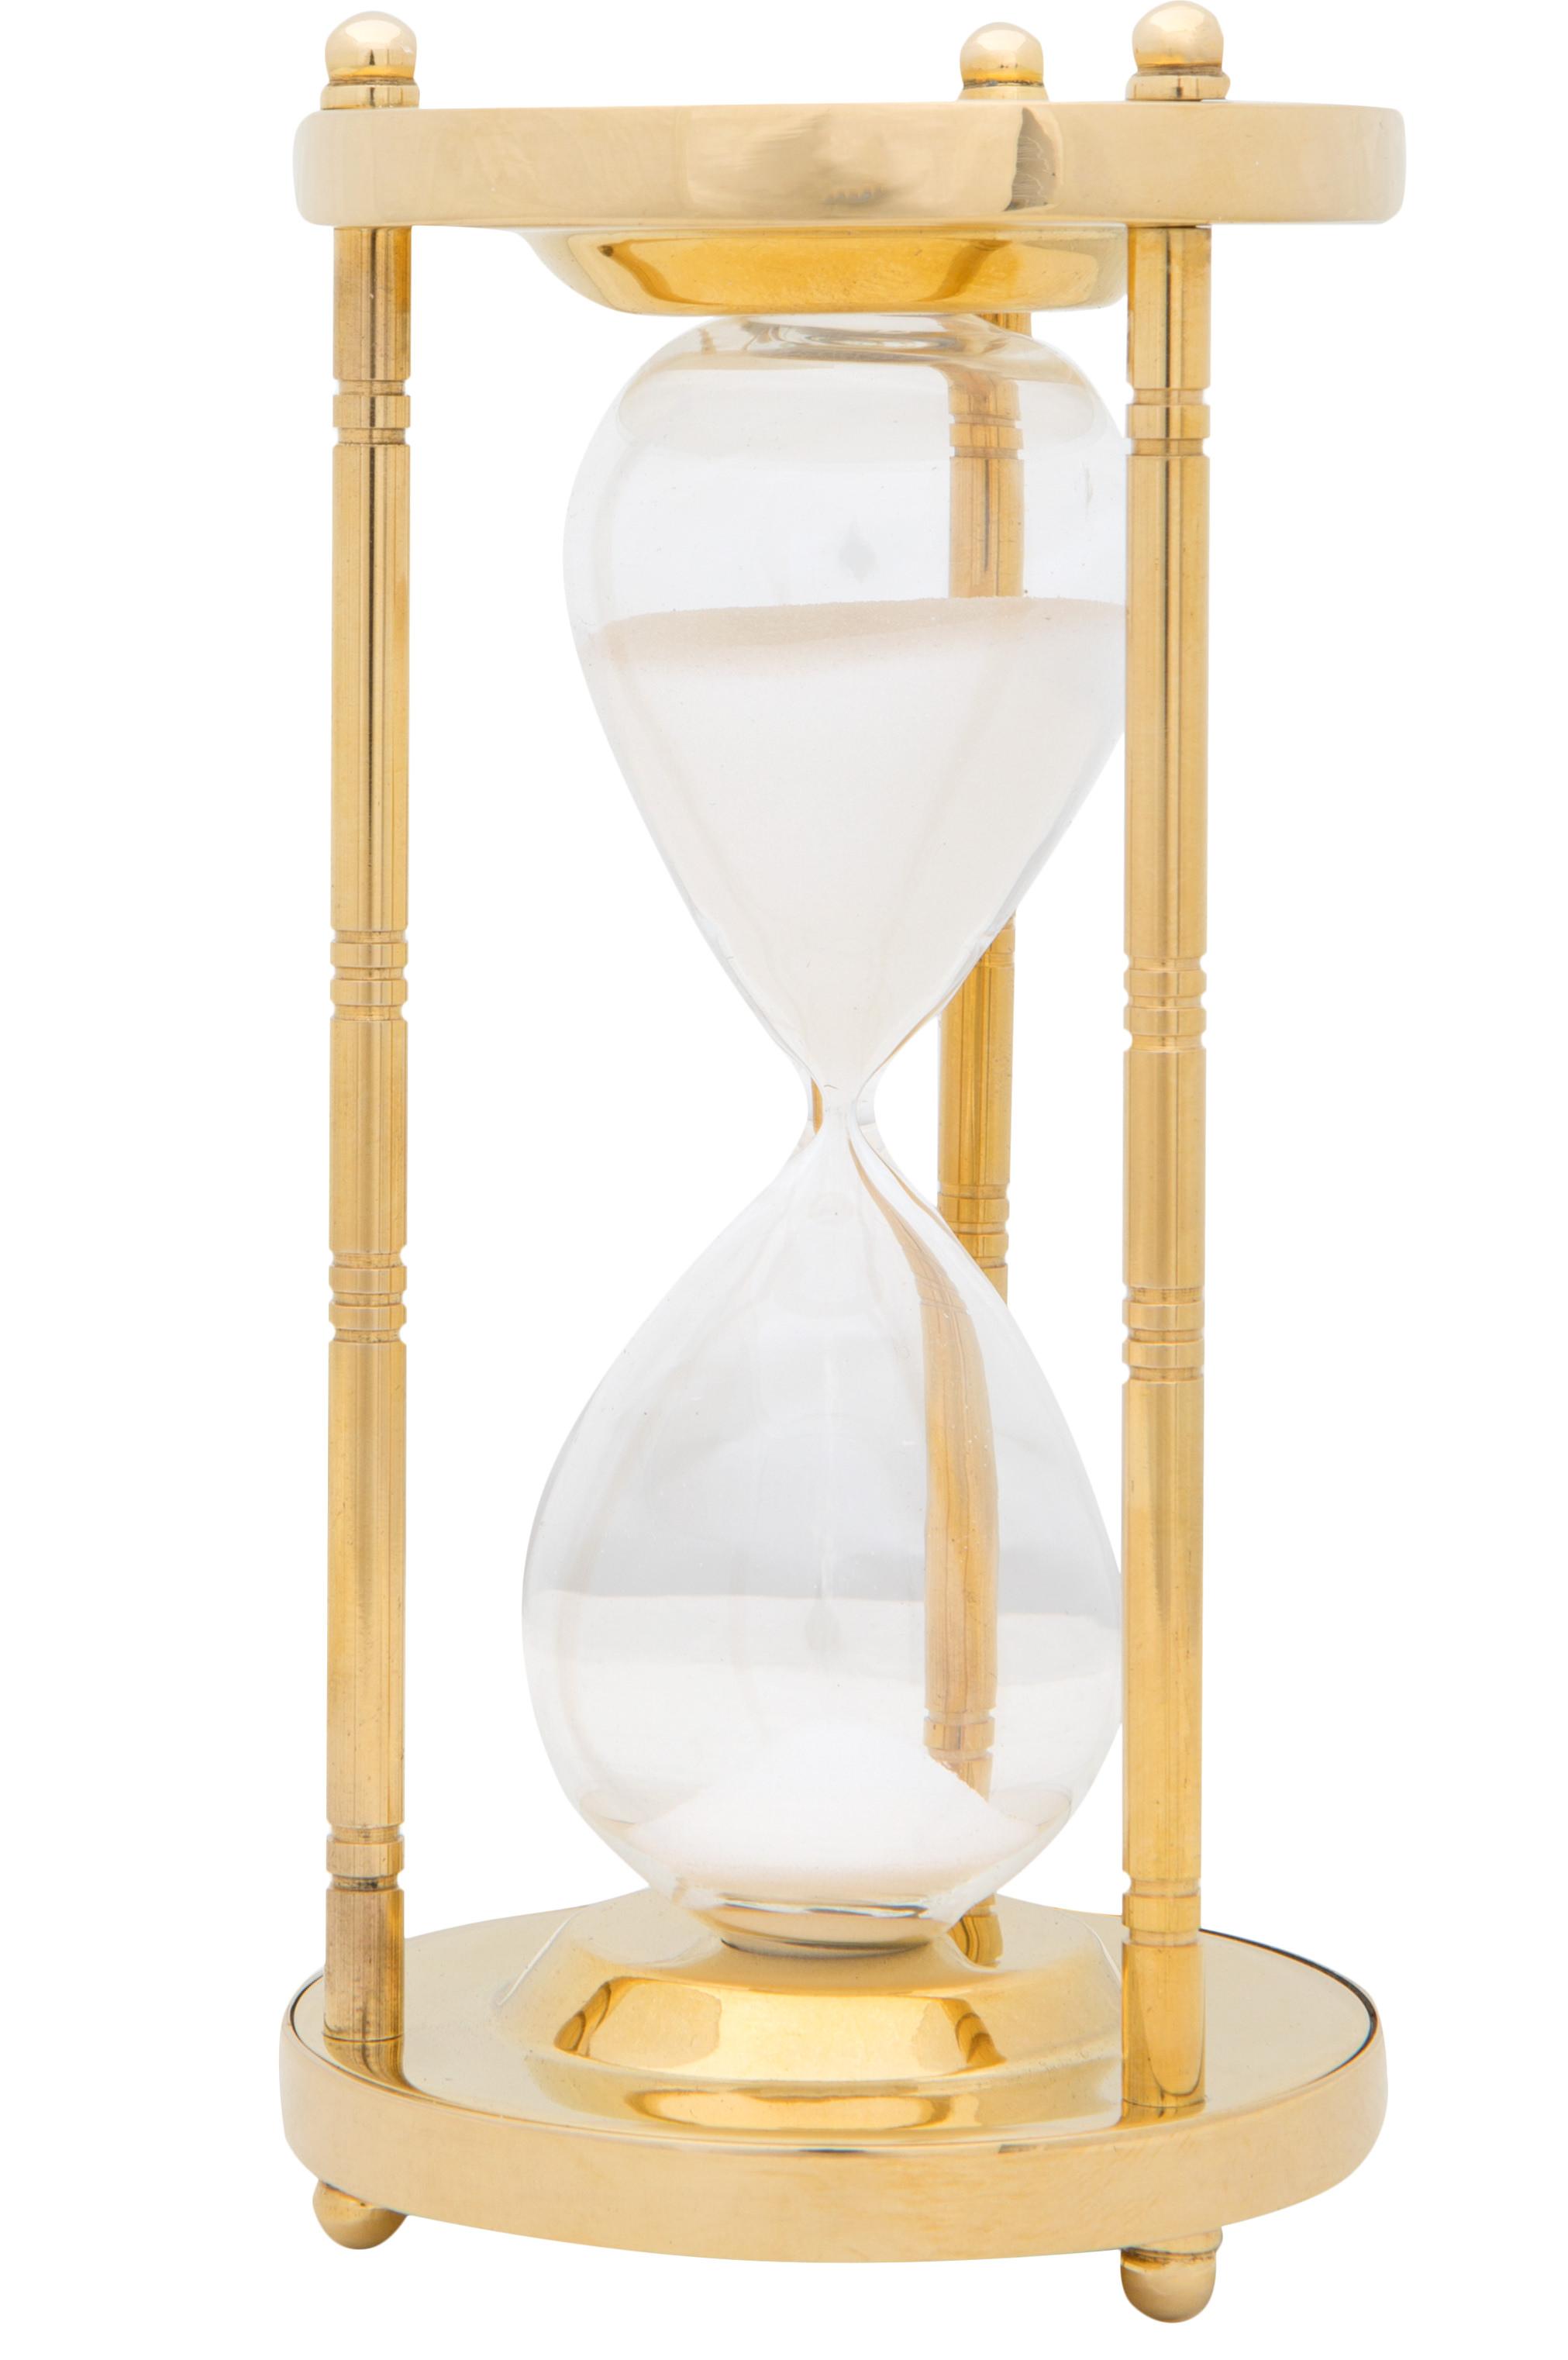 Online shop f r sanduhren 5 minuten mare me maritime dekoration geschenke - Holzpaddel deko ...